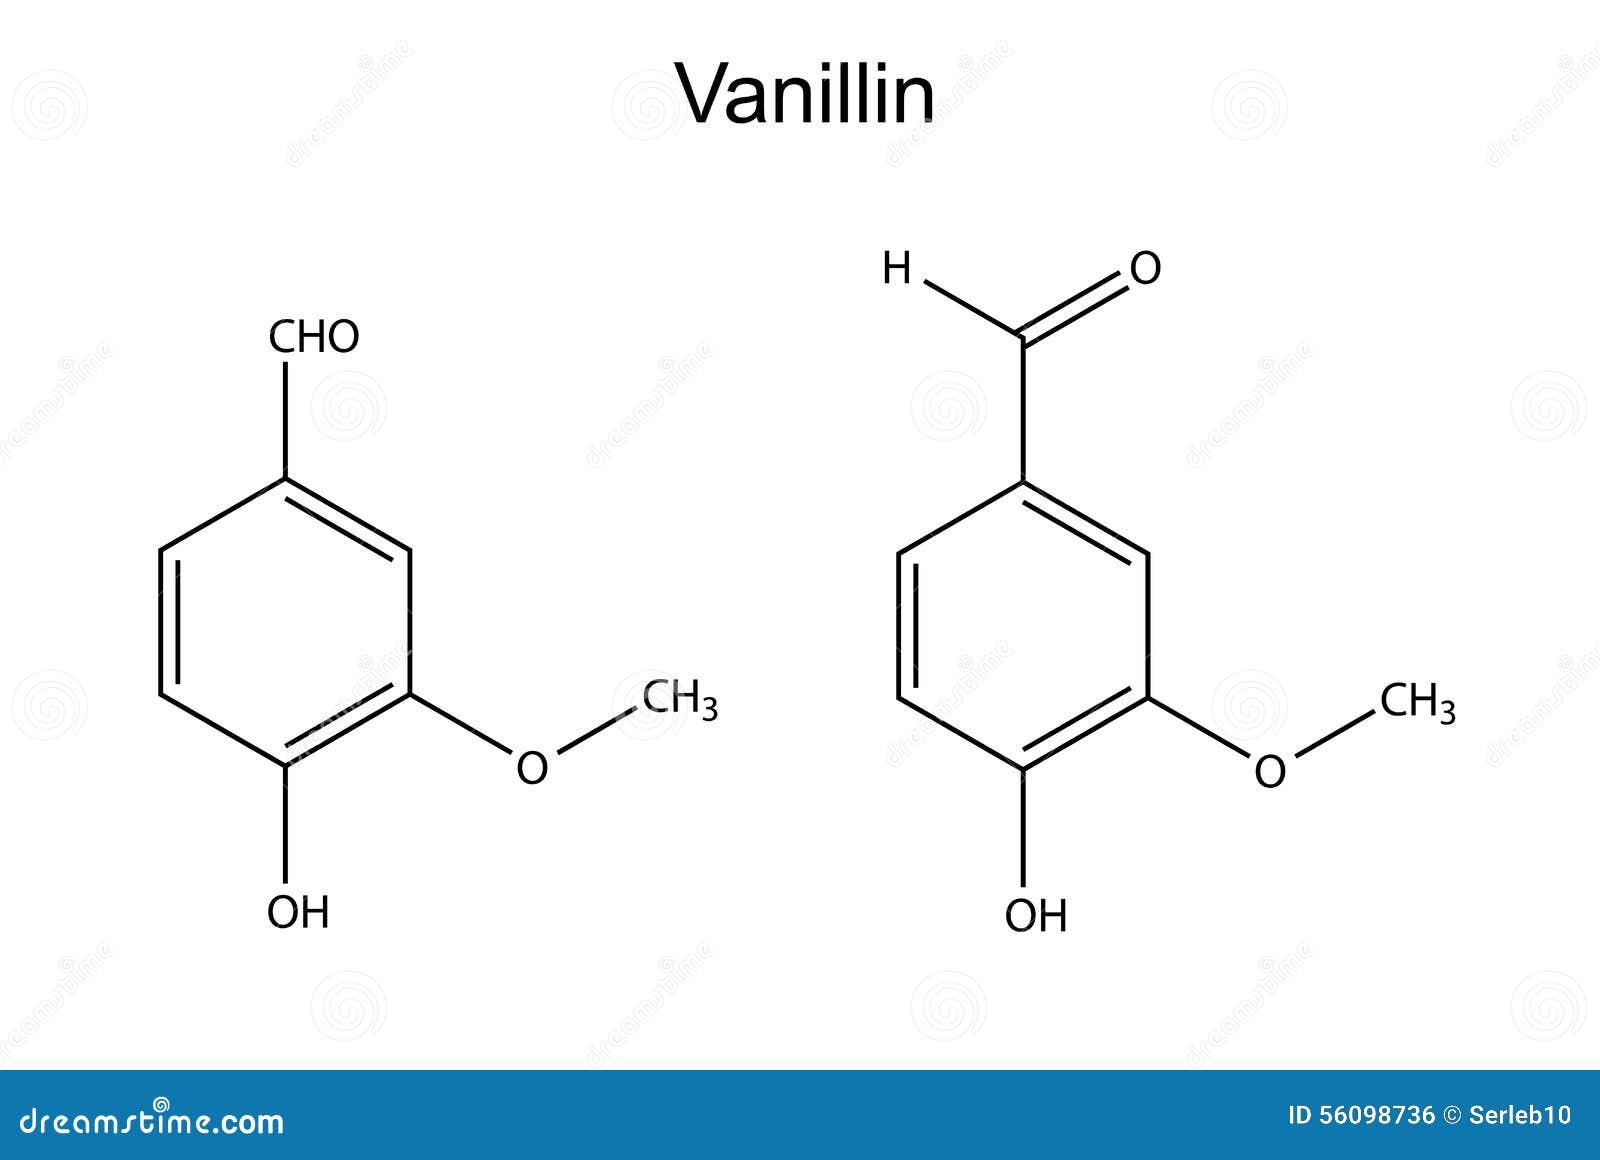 Chemical formula of vanillin molecule flavor enhancer stock chemical formula of vanillin molecule flavor enhancer pooptronica